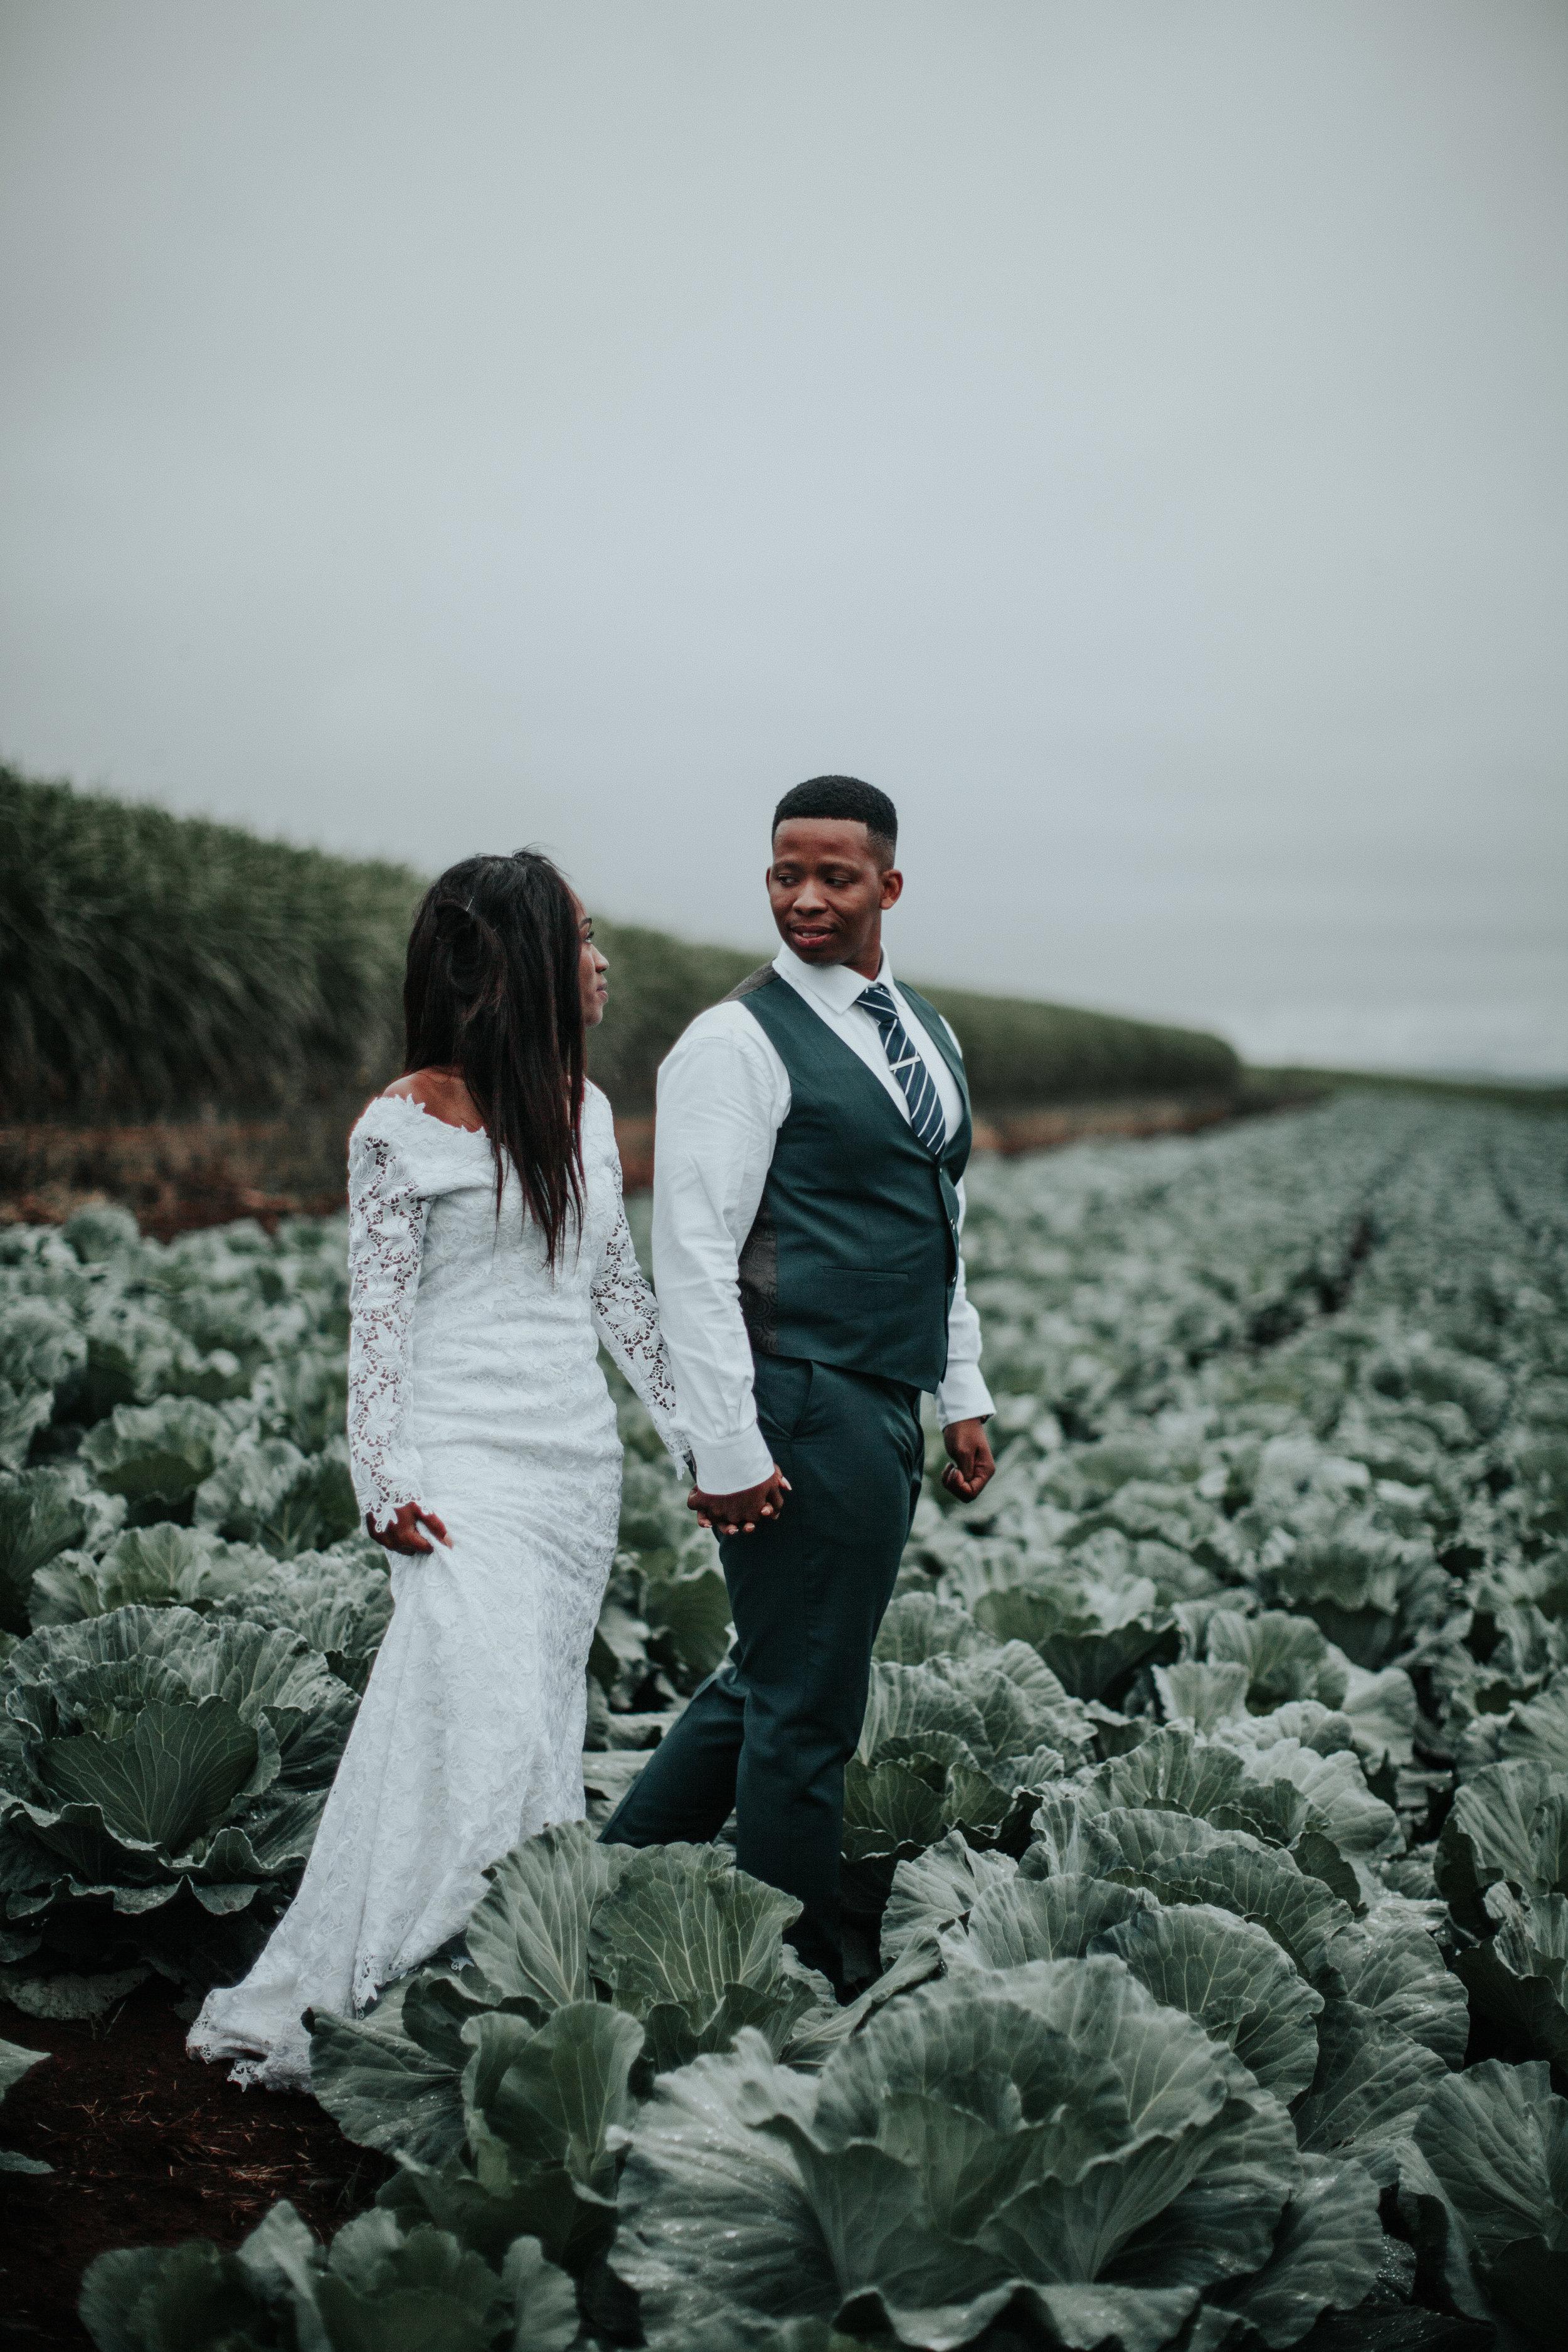 Kristi Smith Photography_Hloni&Nonto_ Wedding Photographer 26.jpg